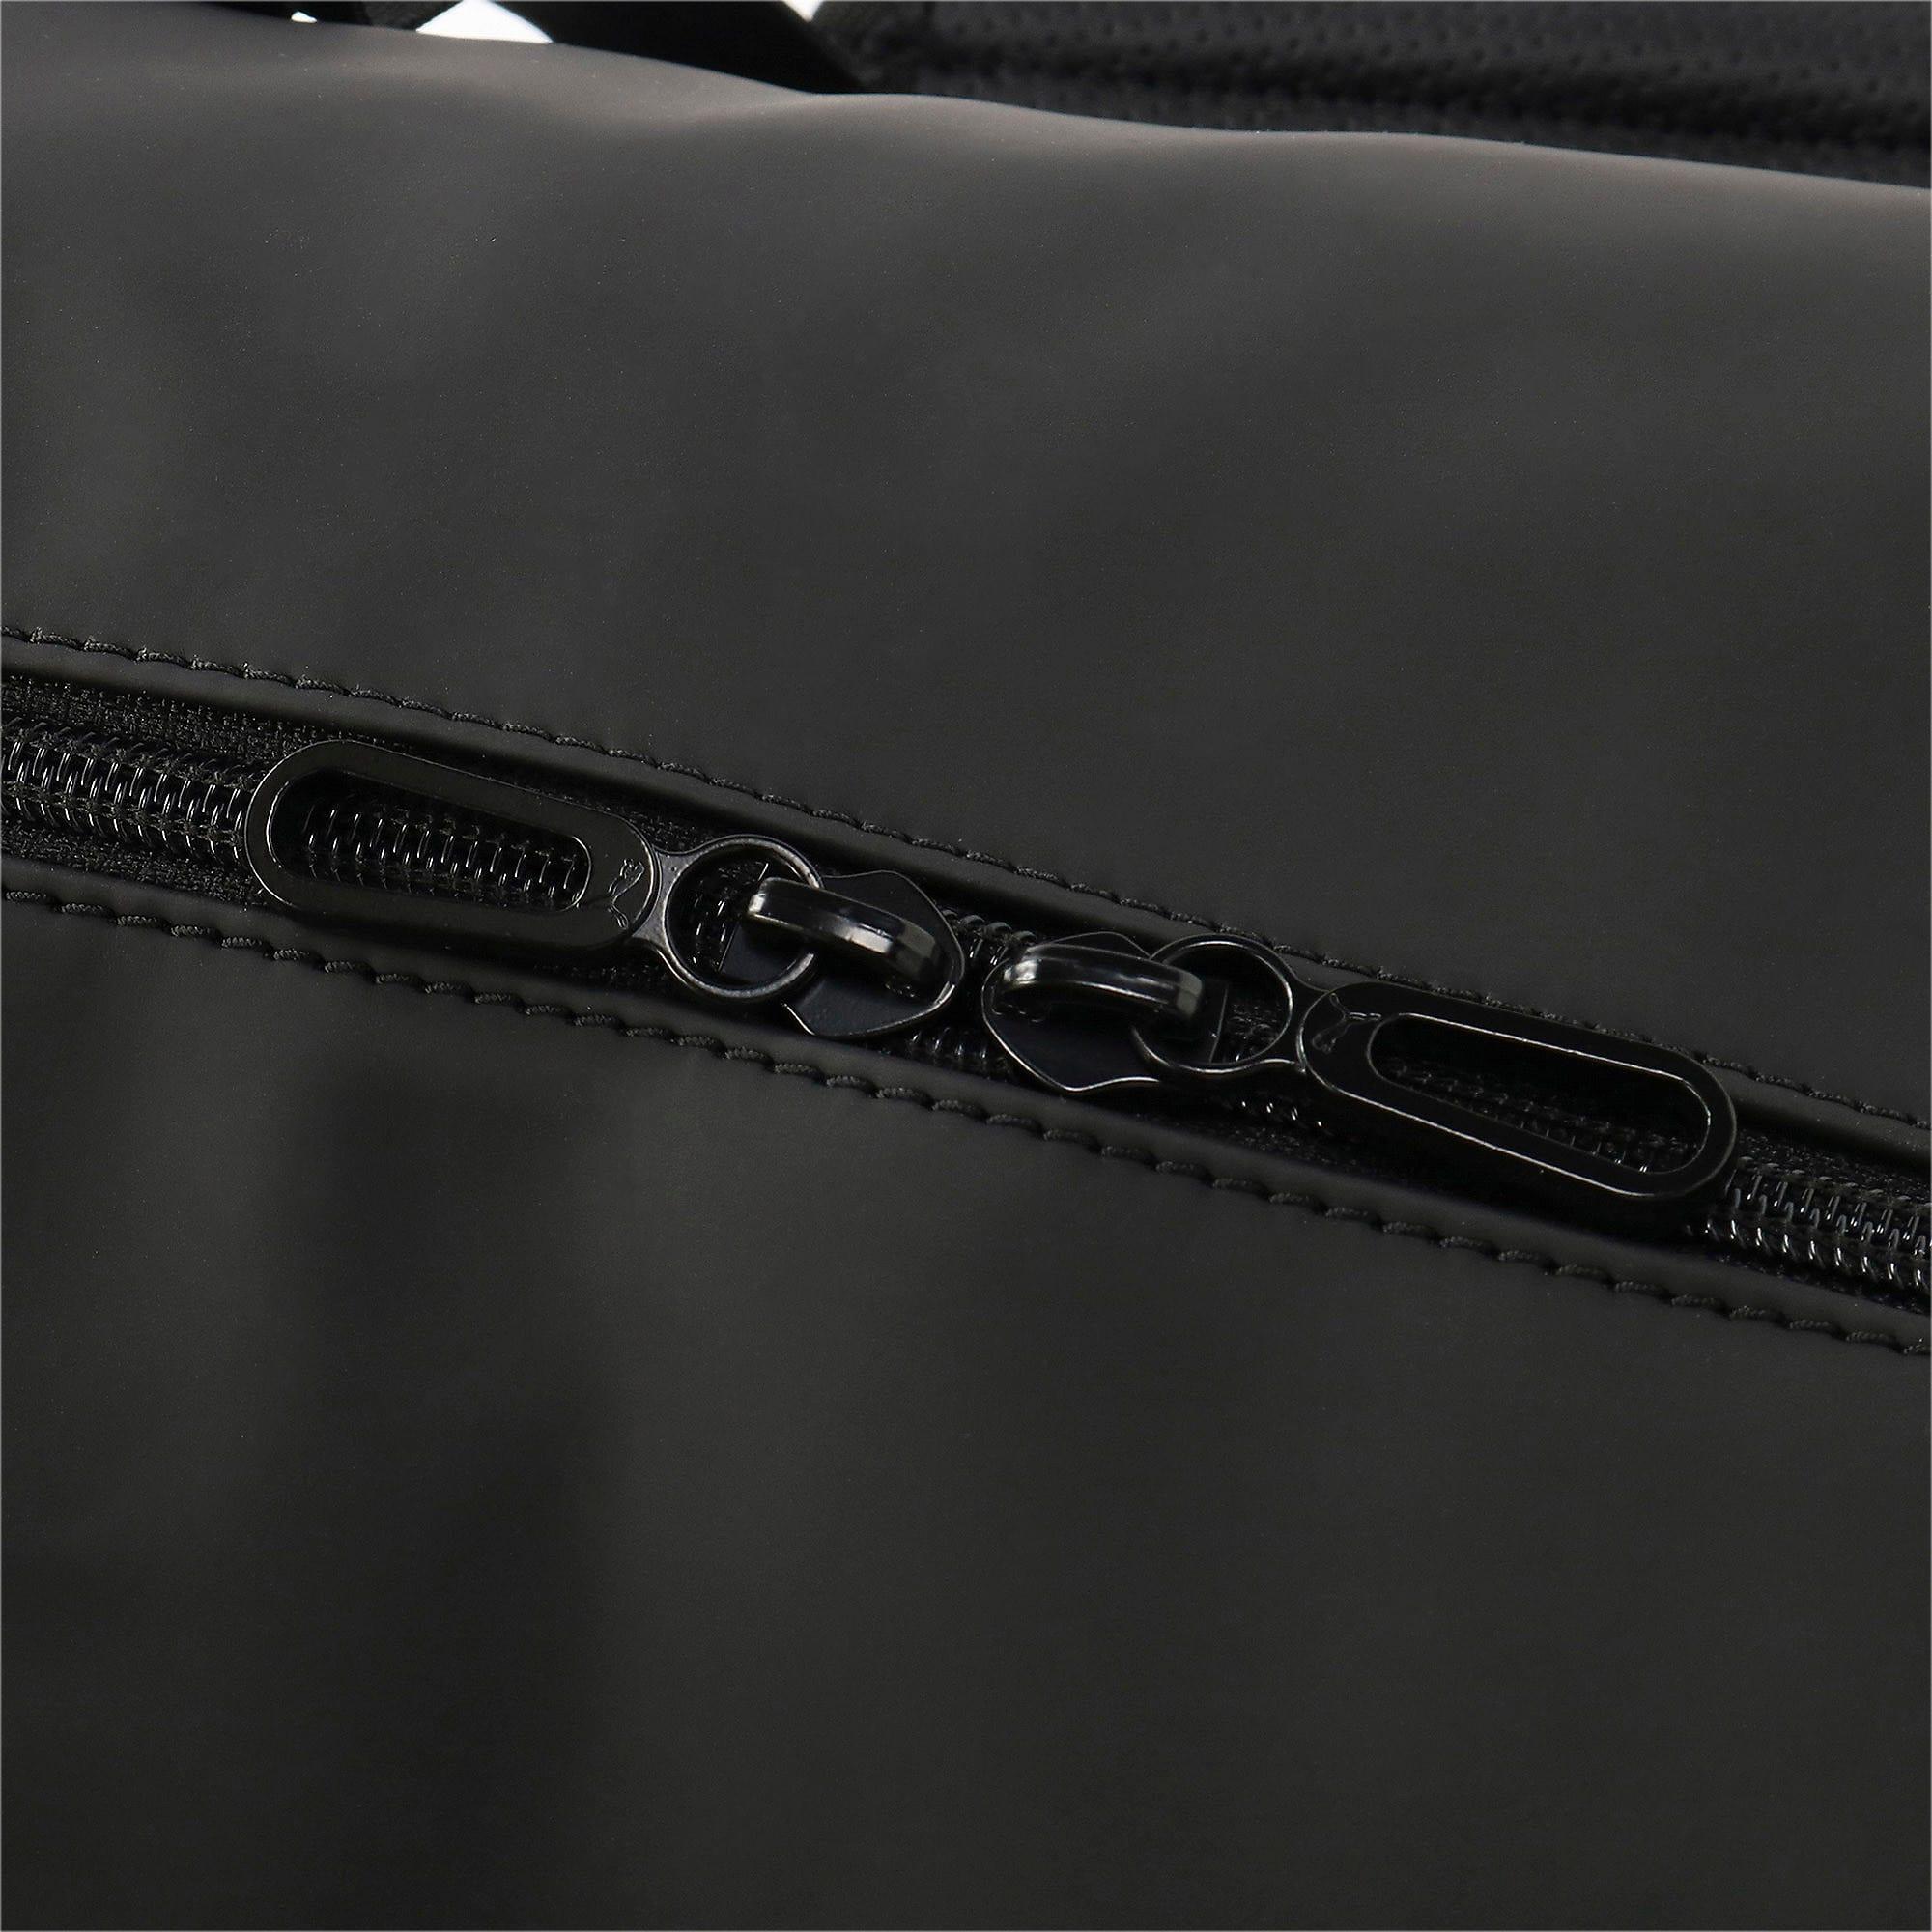 Thumbnail 7 of フェラーリ LS ウィークエンダー (29L), Puma Black, medium-JPN